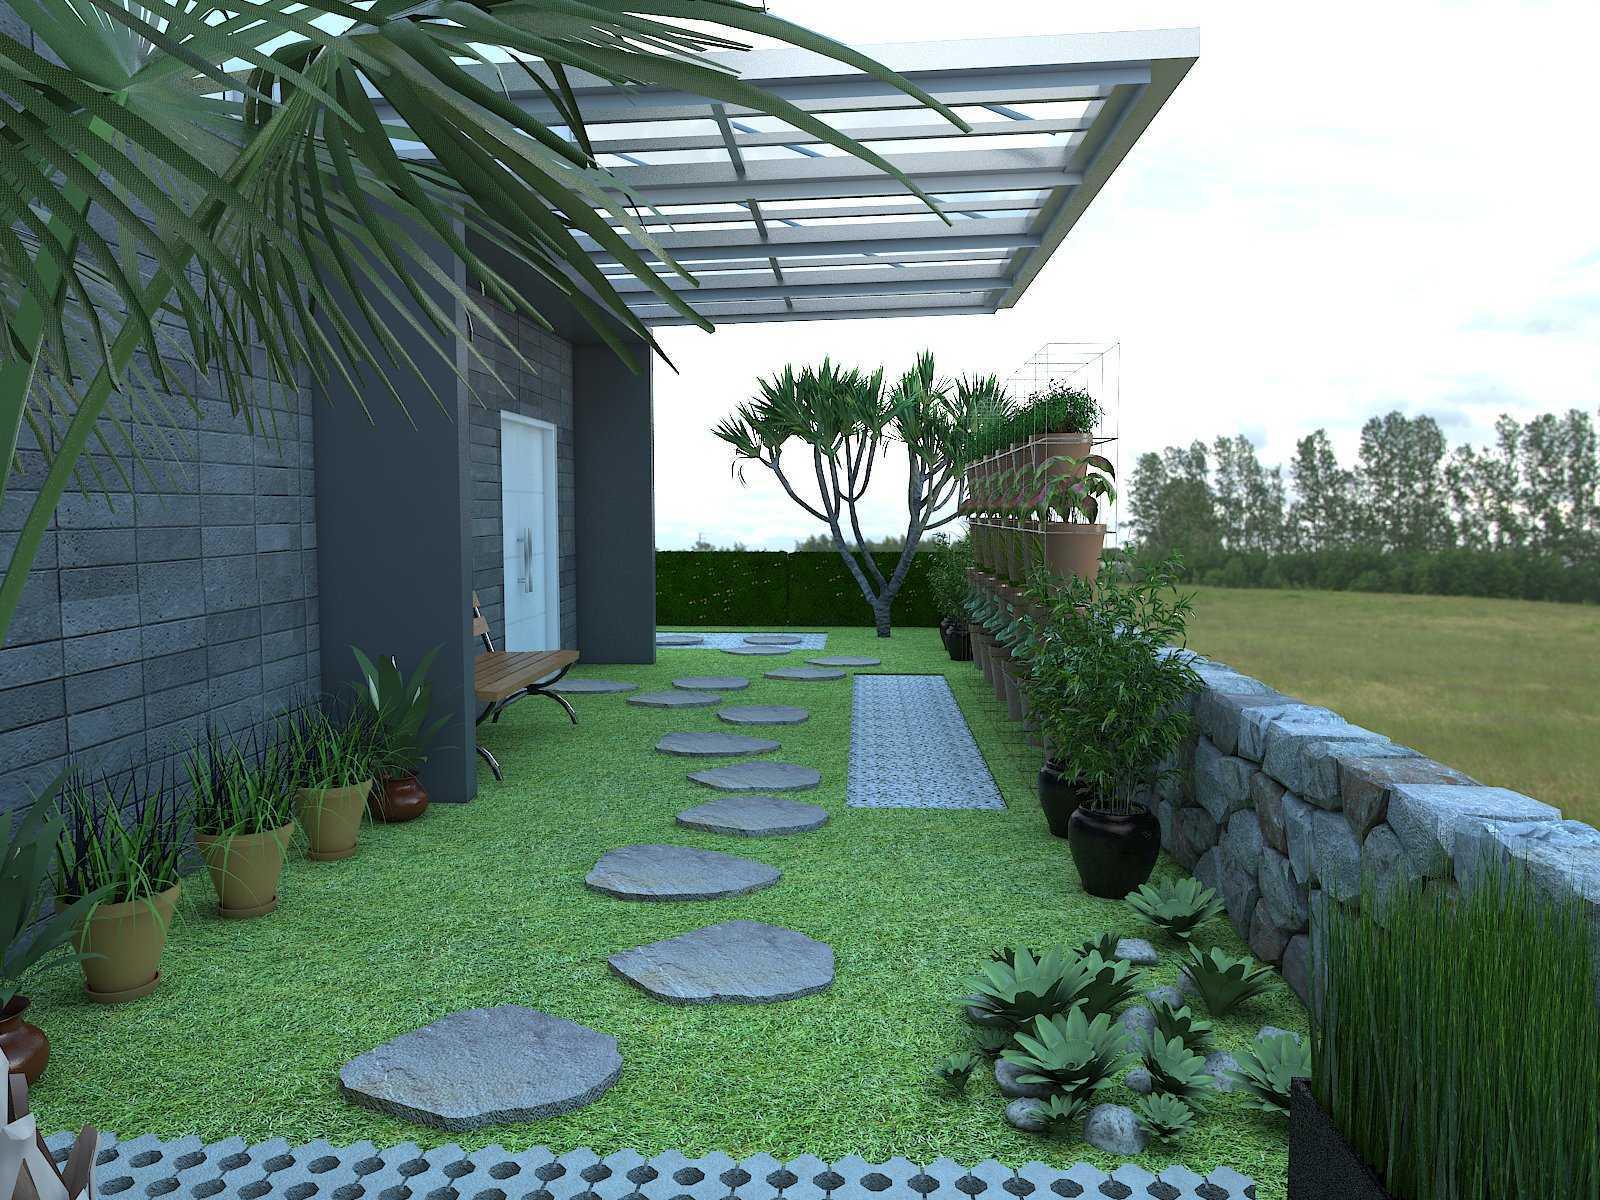 Donnie Marcellino Mr.f's House  Gg. Buntu 2, Jatimelati, Pondokmelati, Kota Bks, Jawa Barat 17415, Indonesia Greenery Design Kontemporer  30160